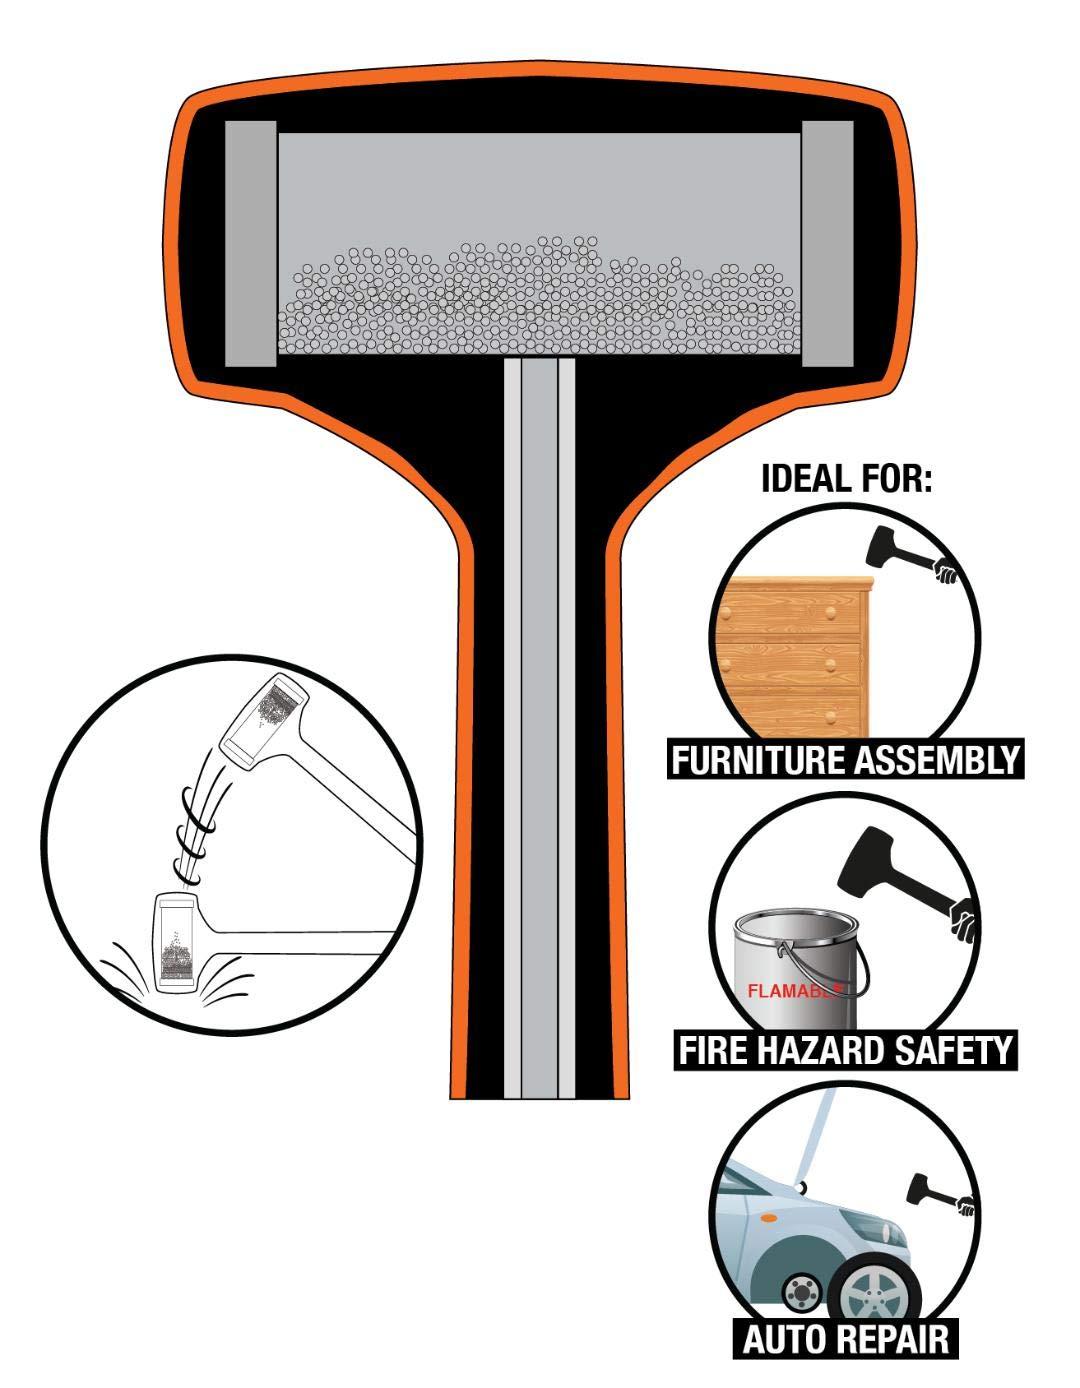 Neon Orange 3 LB Spark and Rebound Resistant Dead Blow Hammer